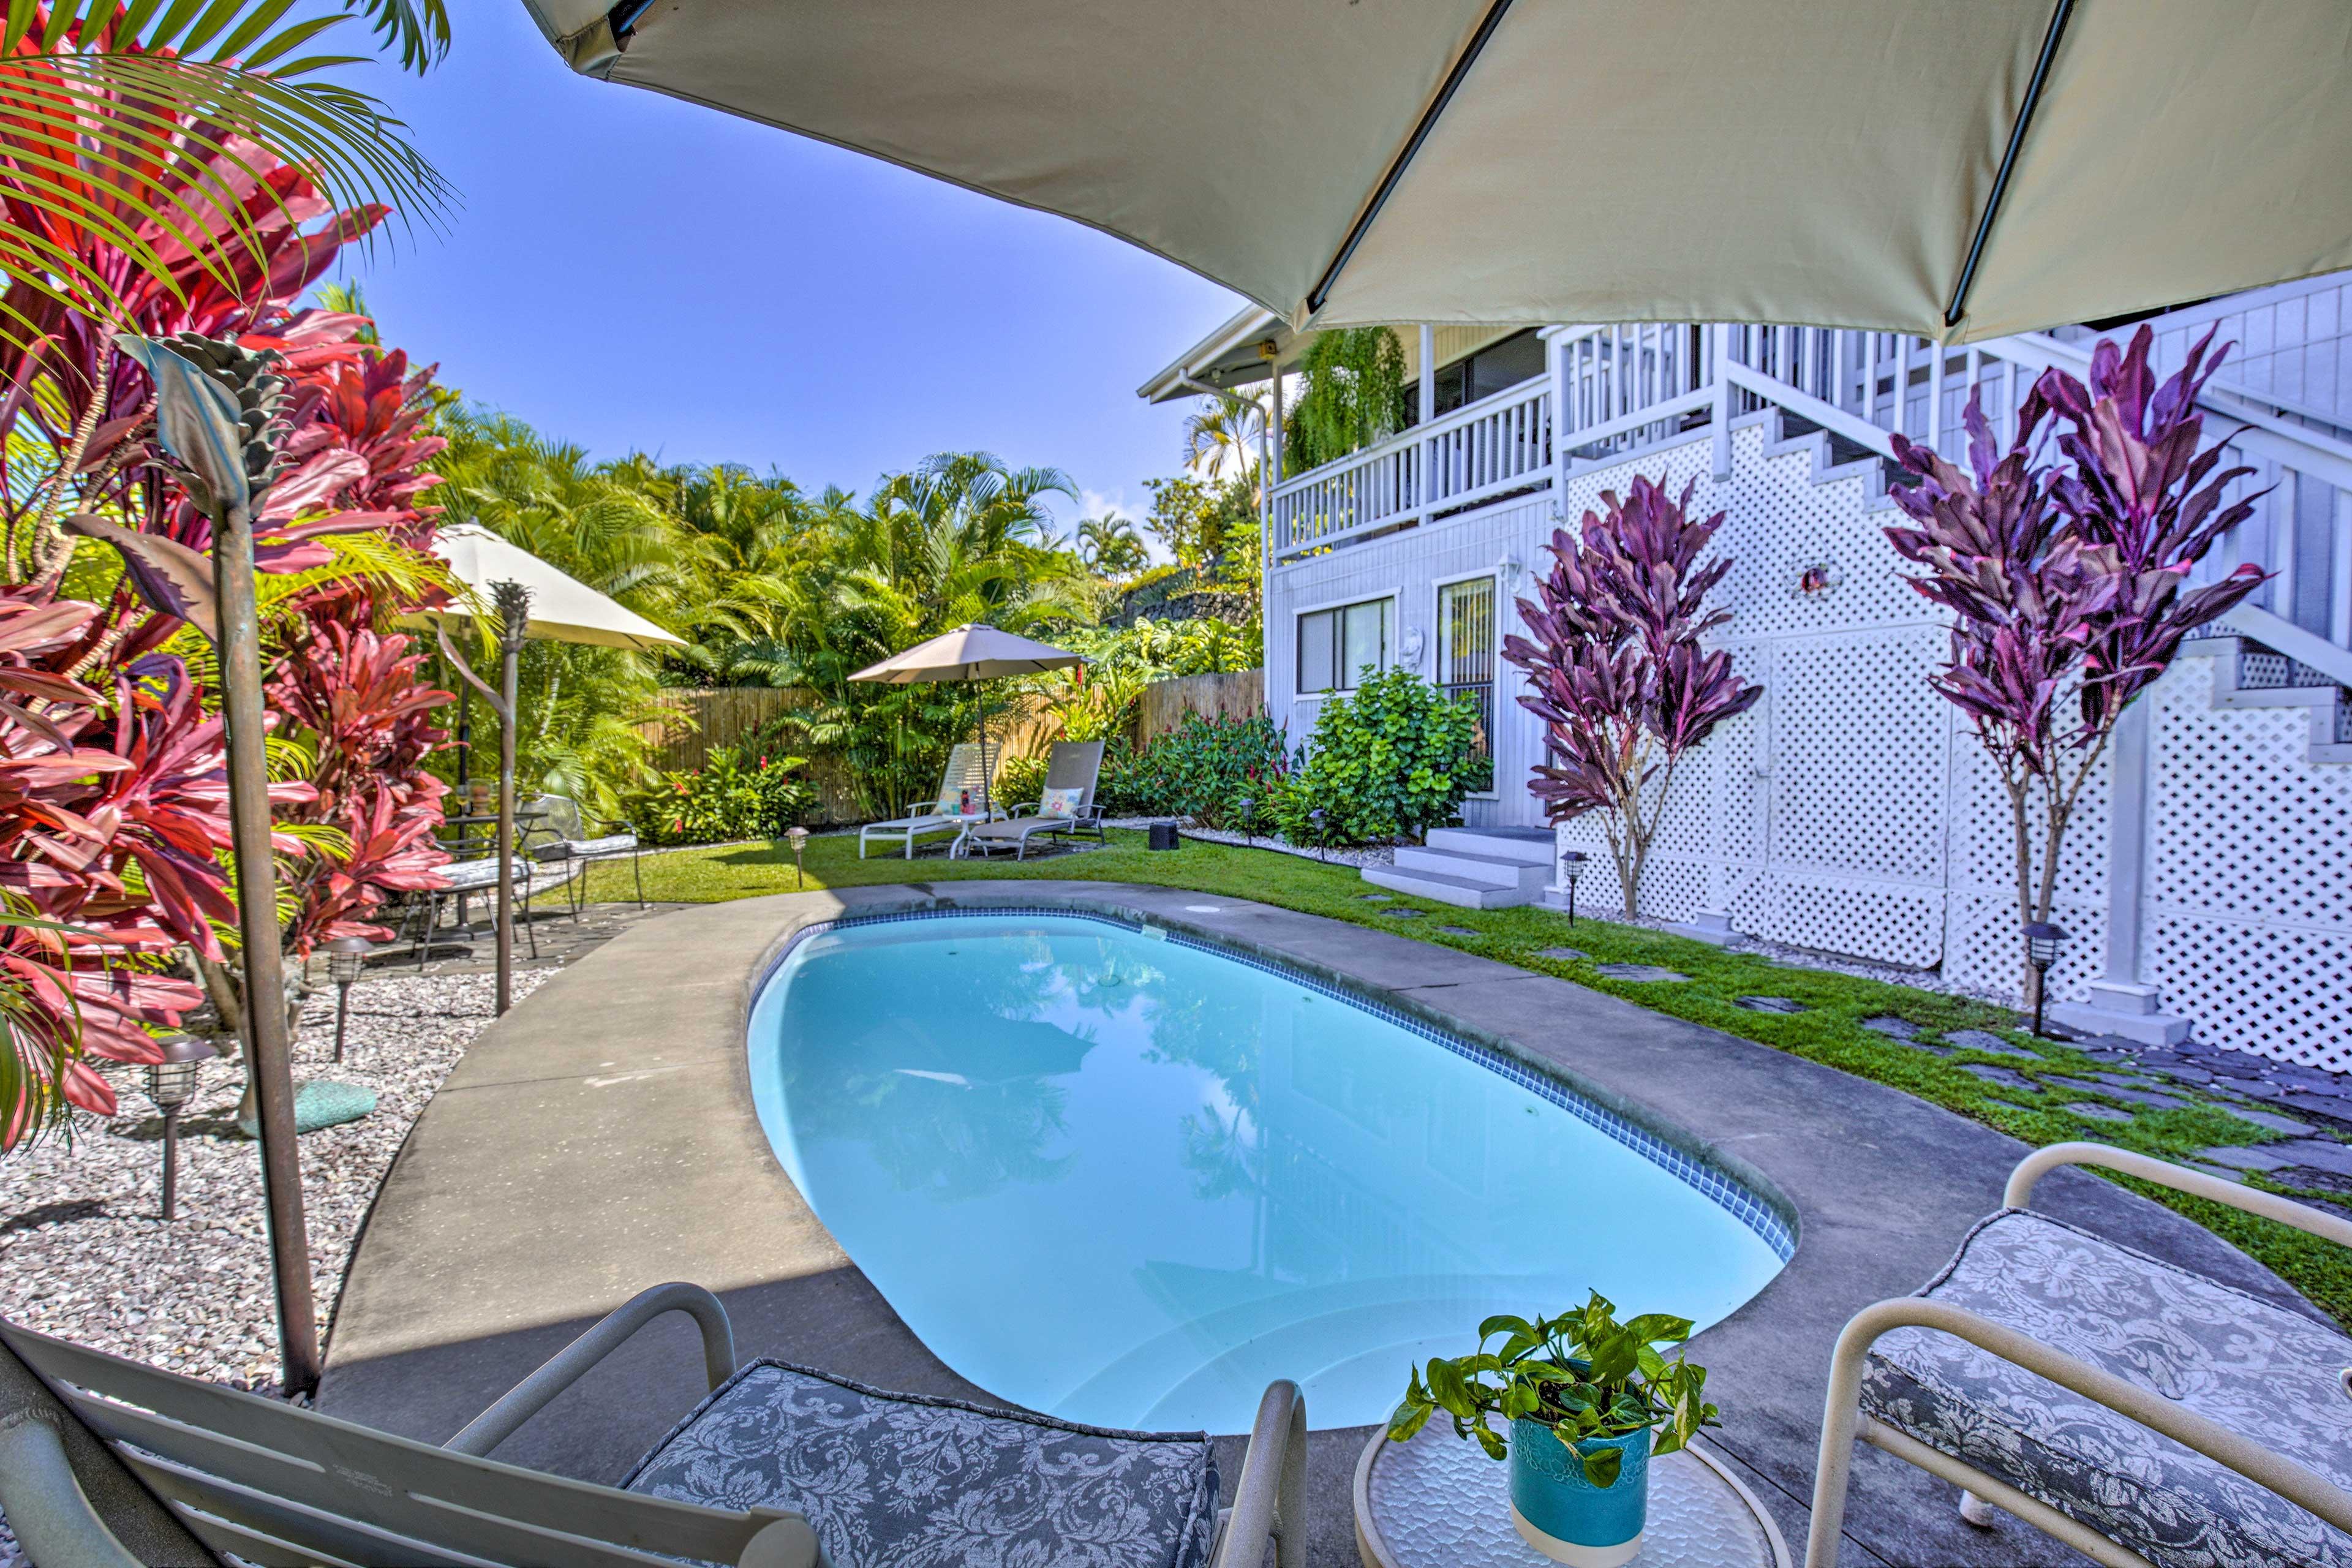 Kailua-Kona Vacation Rental | 1BR | 1BA | 729 Sq Ft | 2 Stories